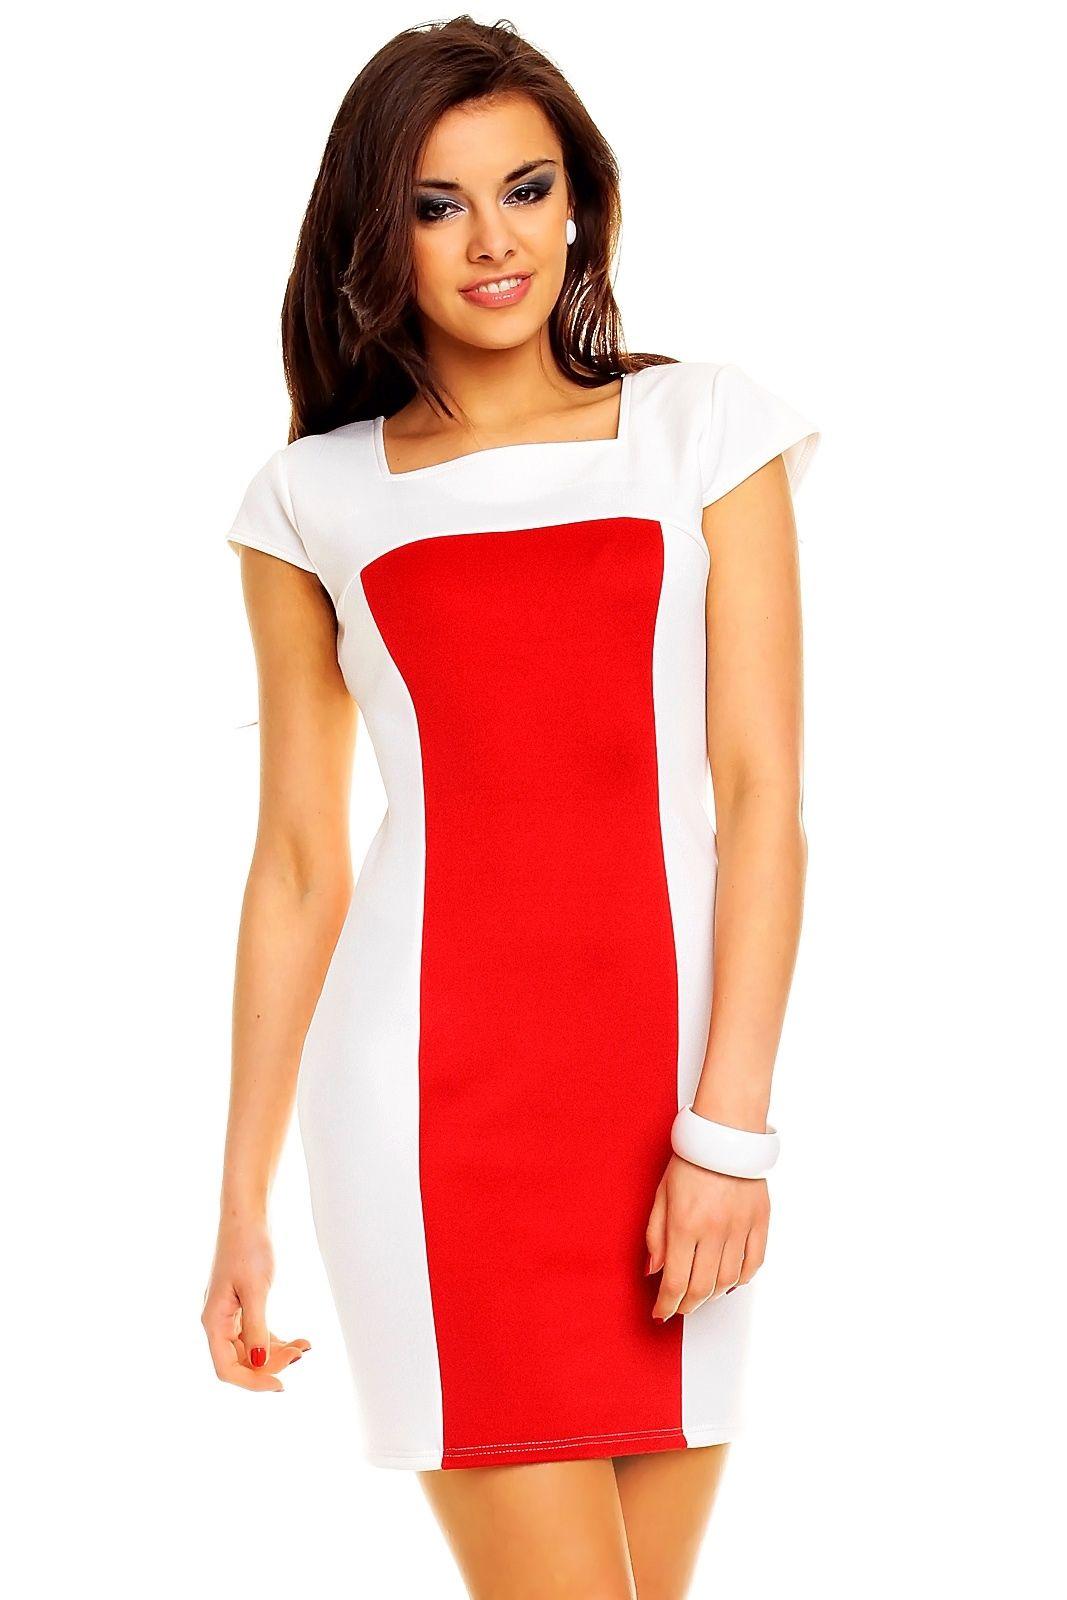 45c5f4ce6239d Robe courte tendance robe couleur corail   Sport sante gironde